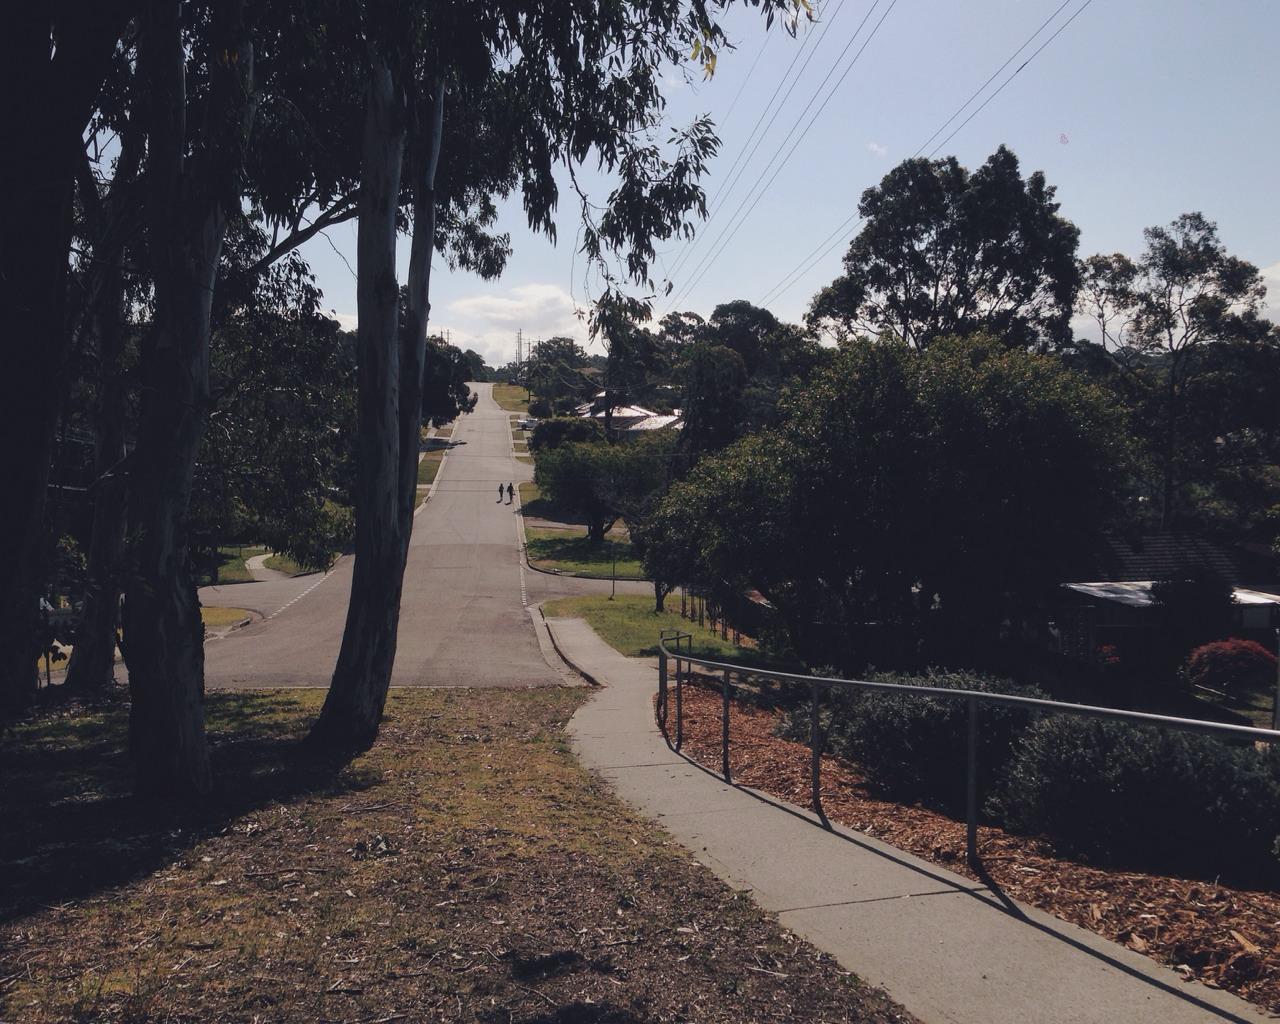 Kareela - 5/5  #suburbia #suburbianviews #urbanlandscape #kareela #documentingspace